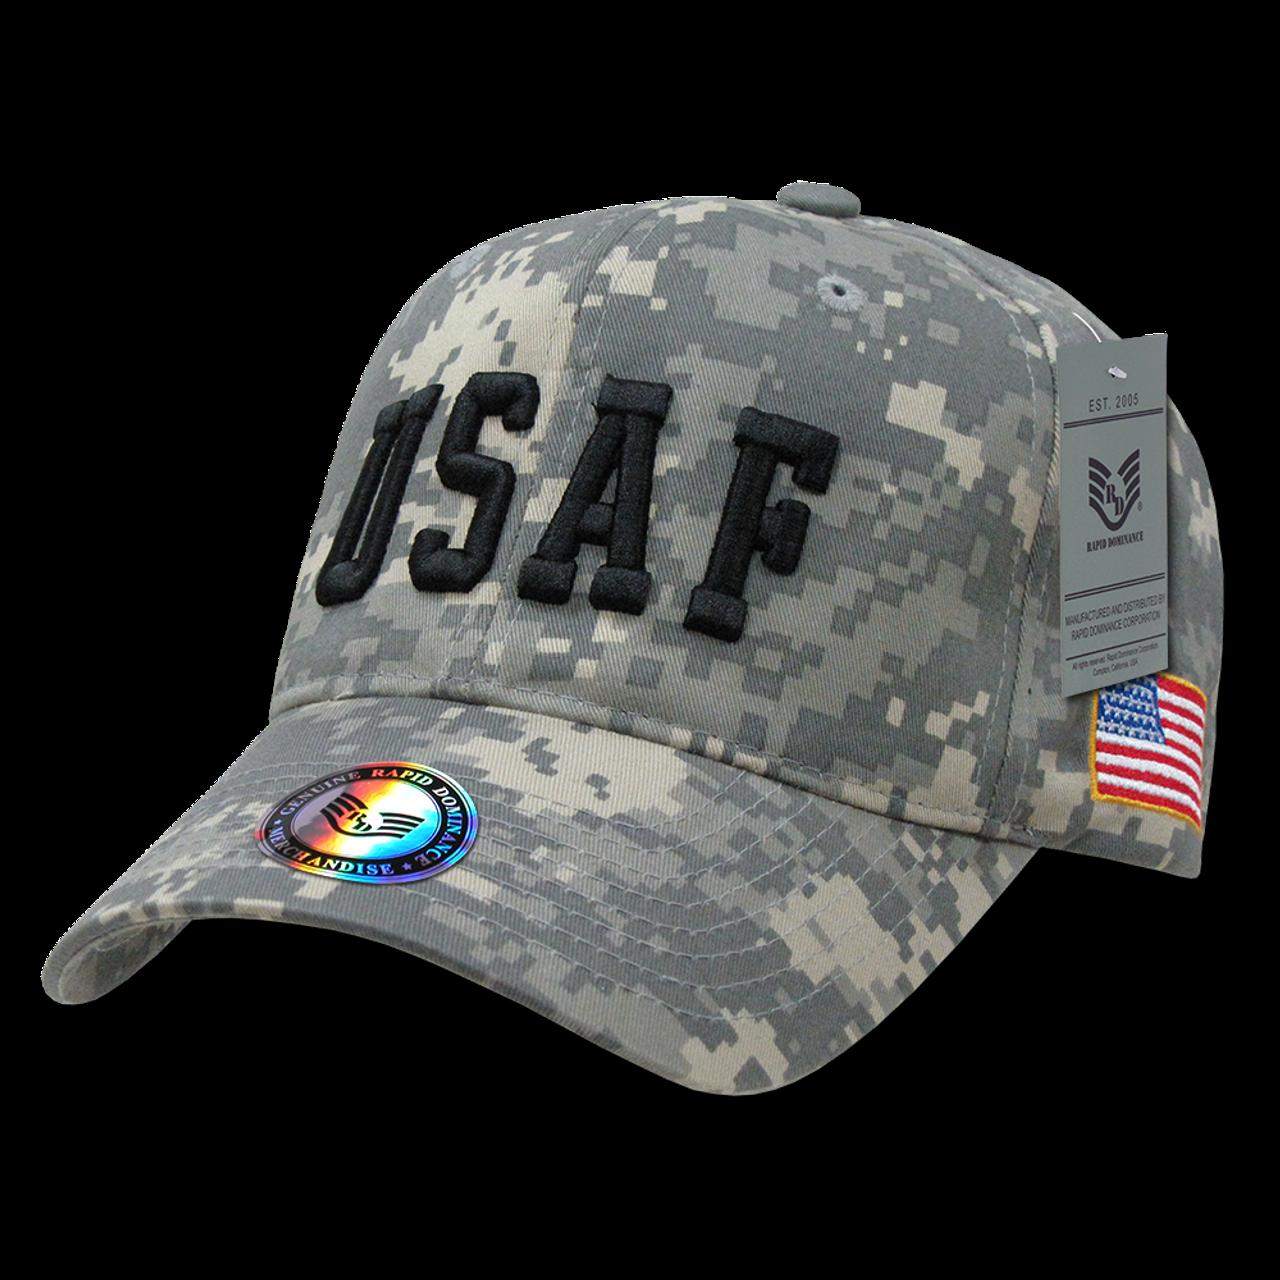 784eebfc5b2 944 - Air Force Cap USAF Text Digital Camouflage ...